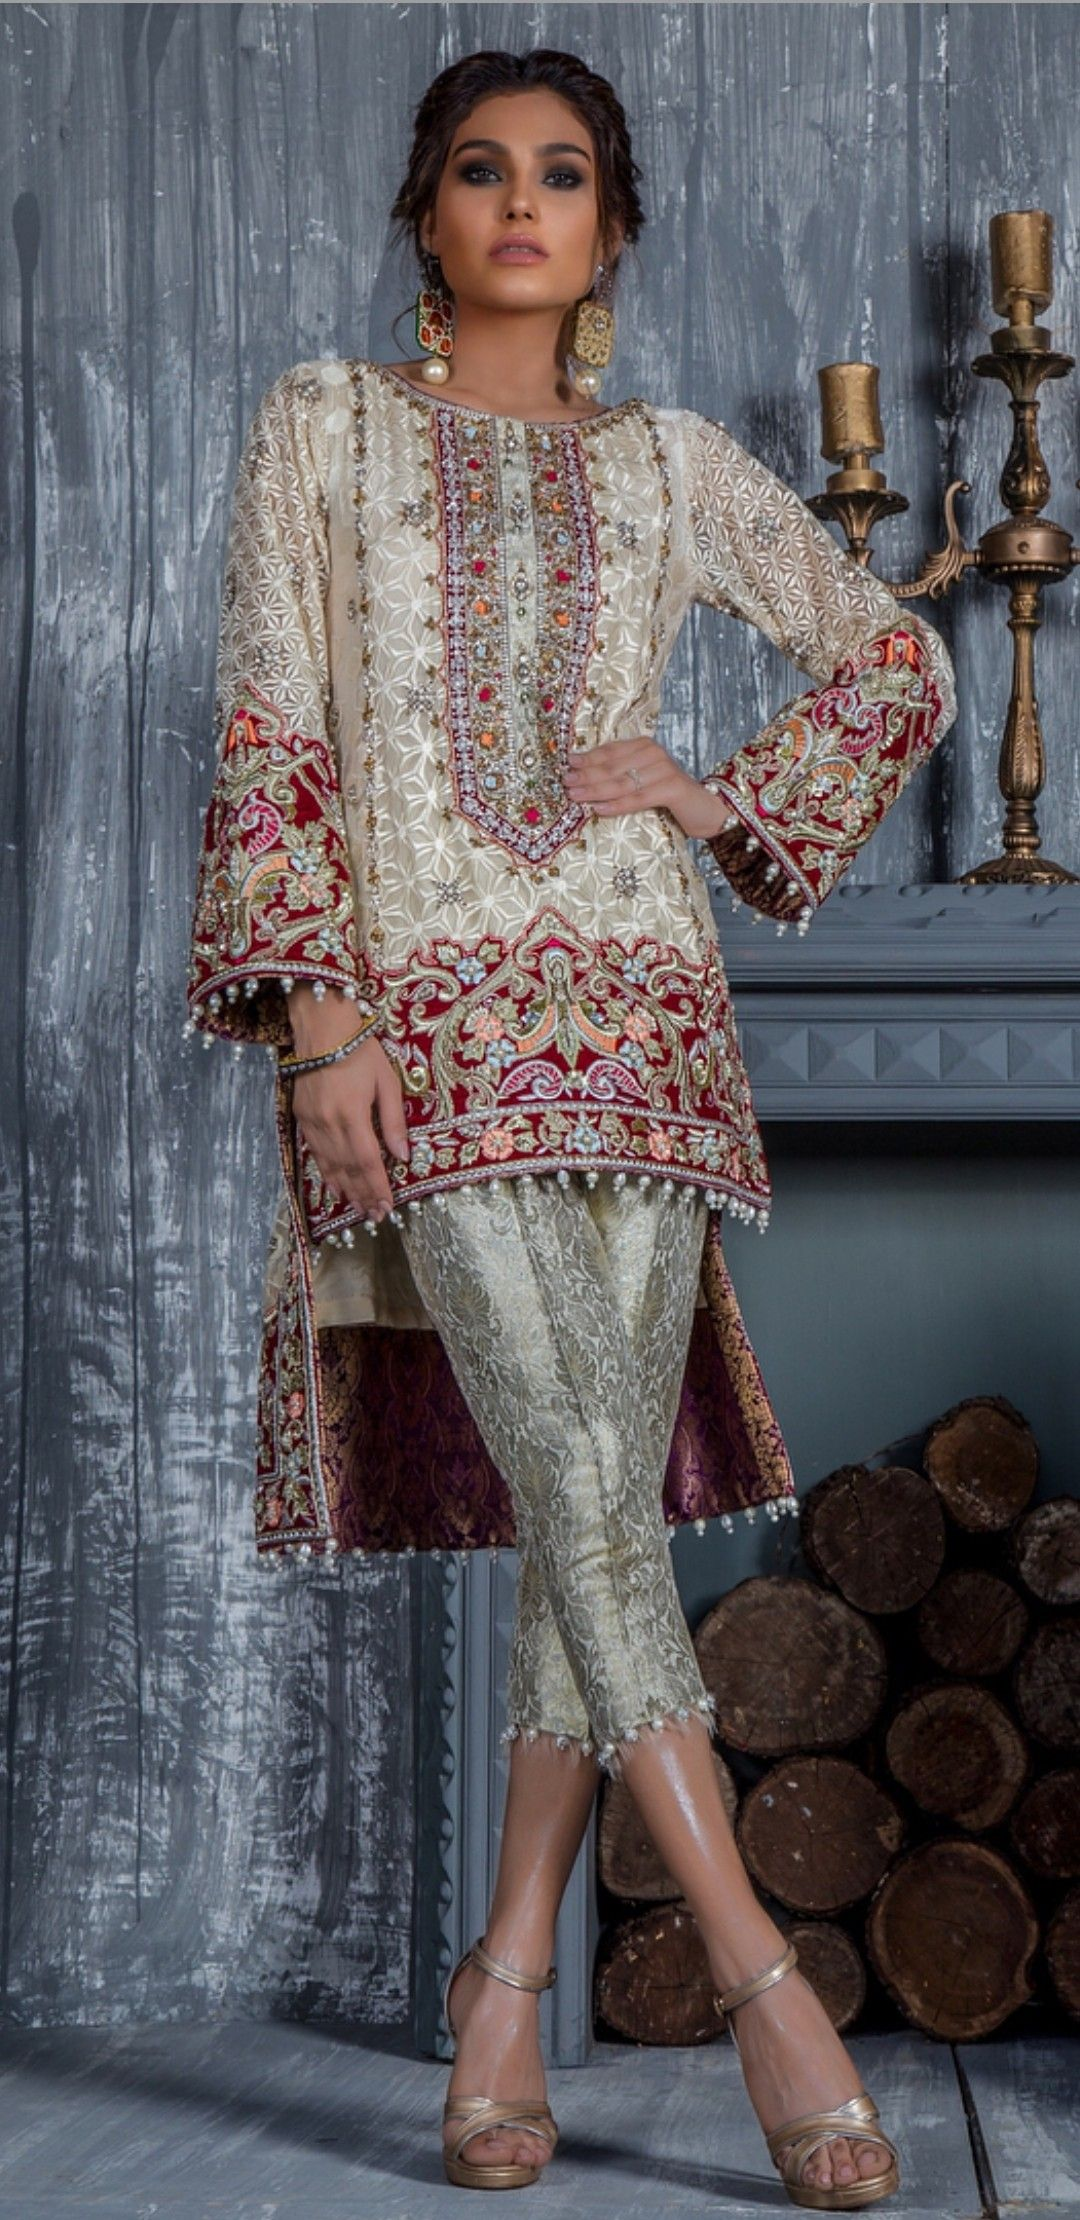 Pin by Jenn Sunkel on Saris, Lenghas, Anarkalis | Pinterest ...